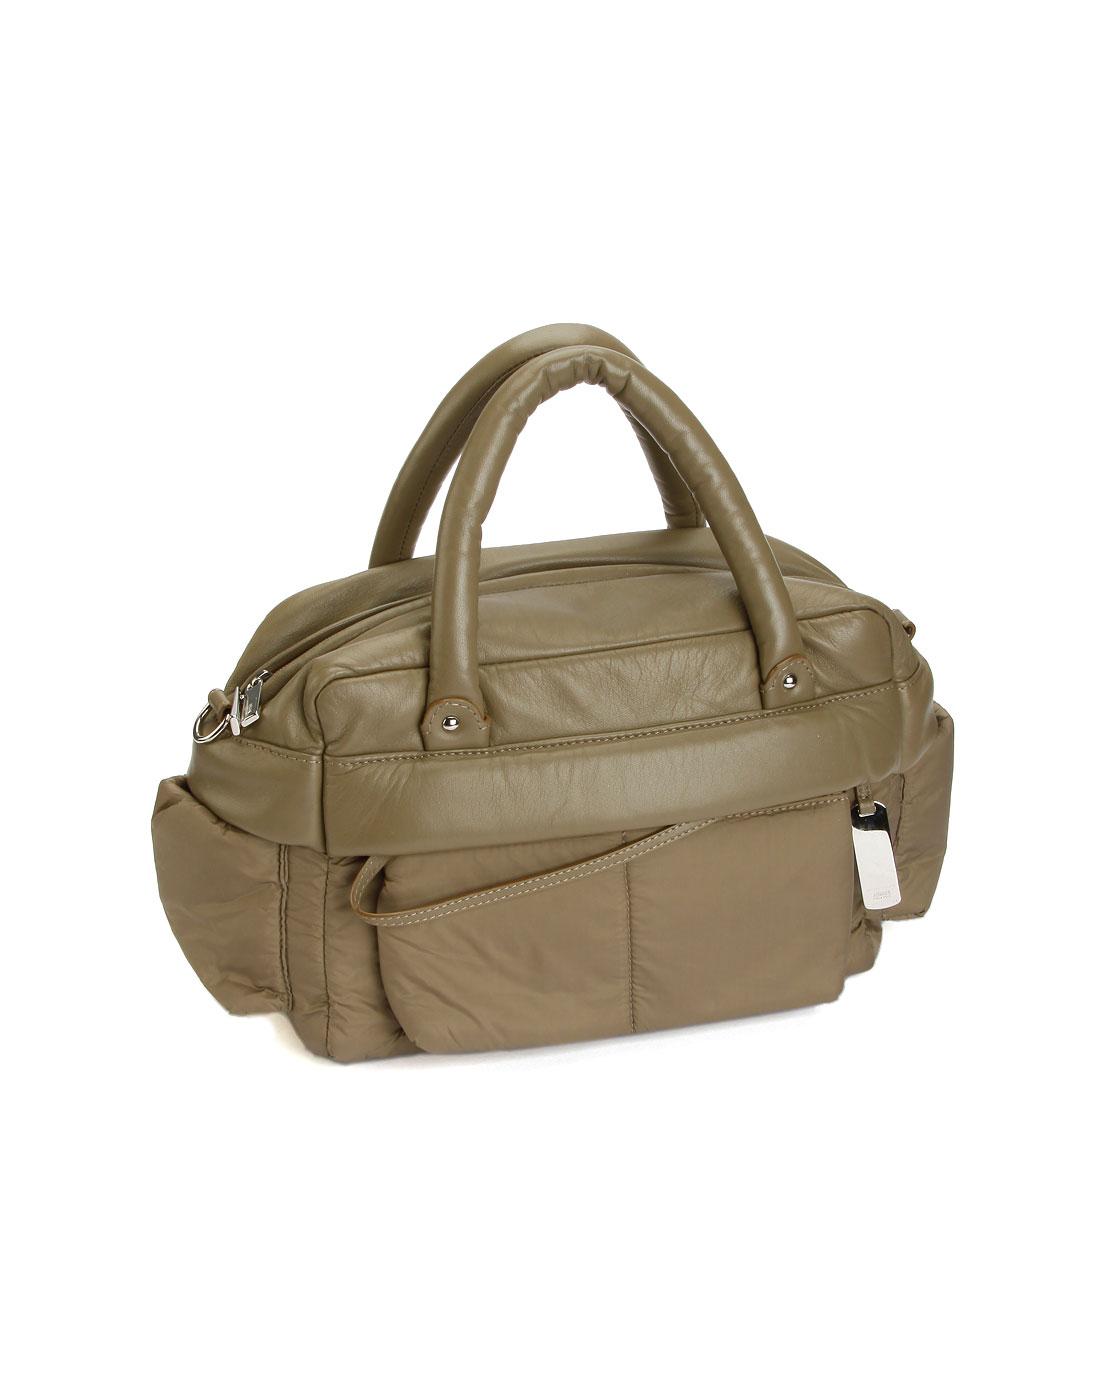 armani女款灰绿色休闲手提包armani-110